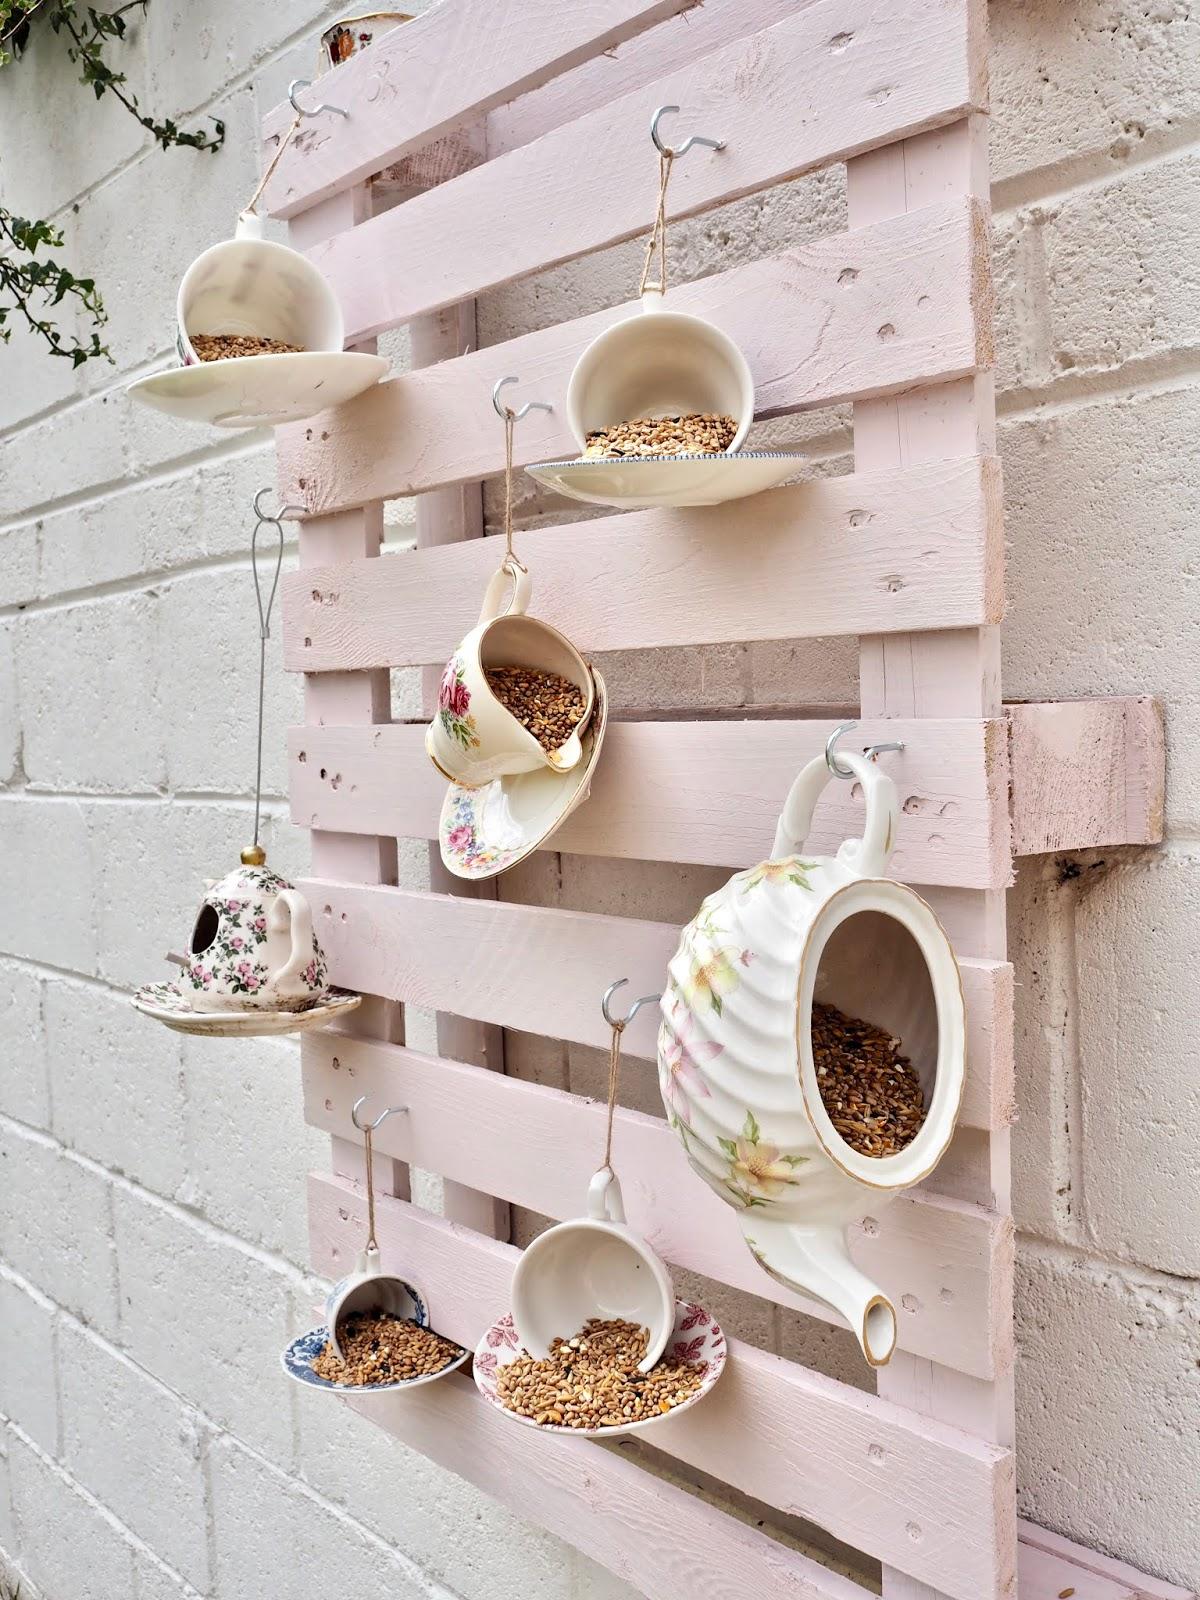 DIY teacup bird feeders